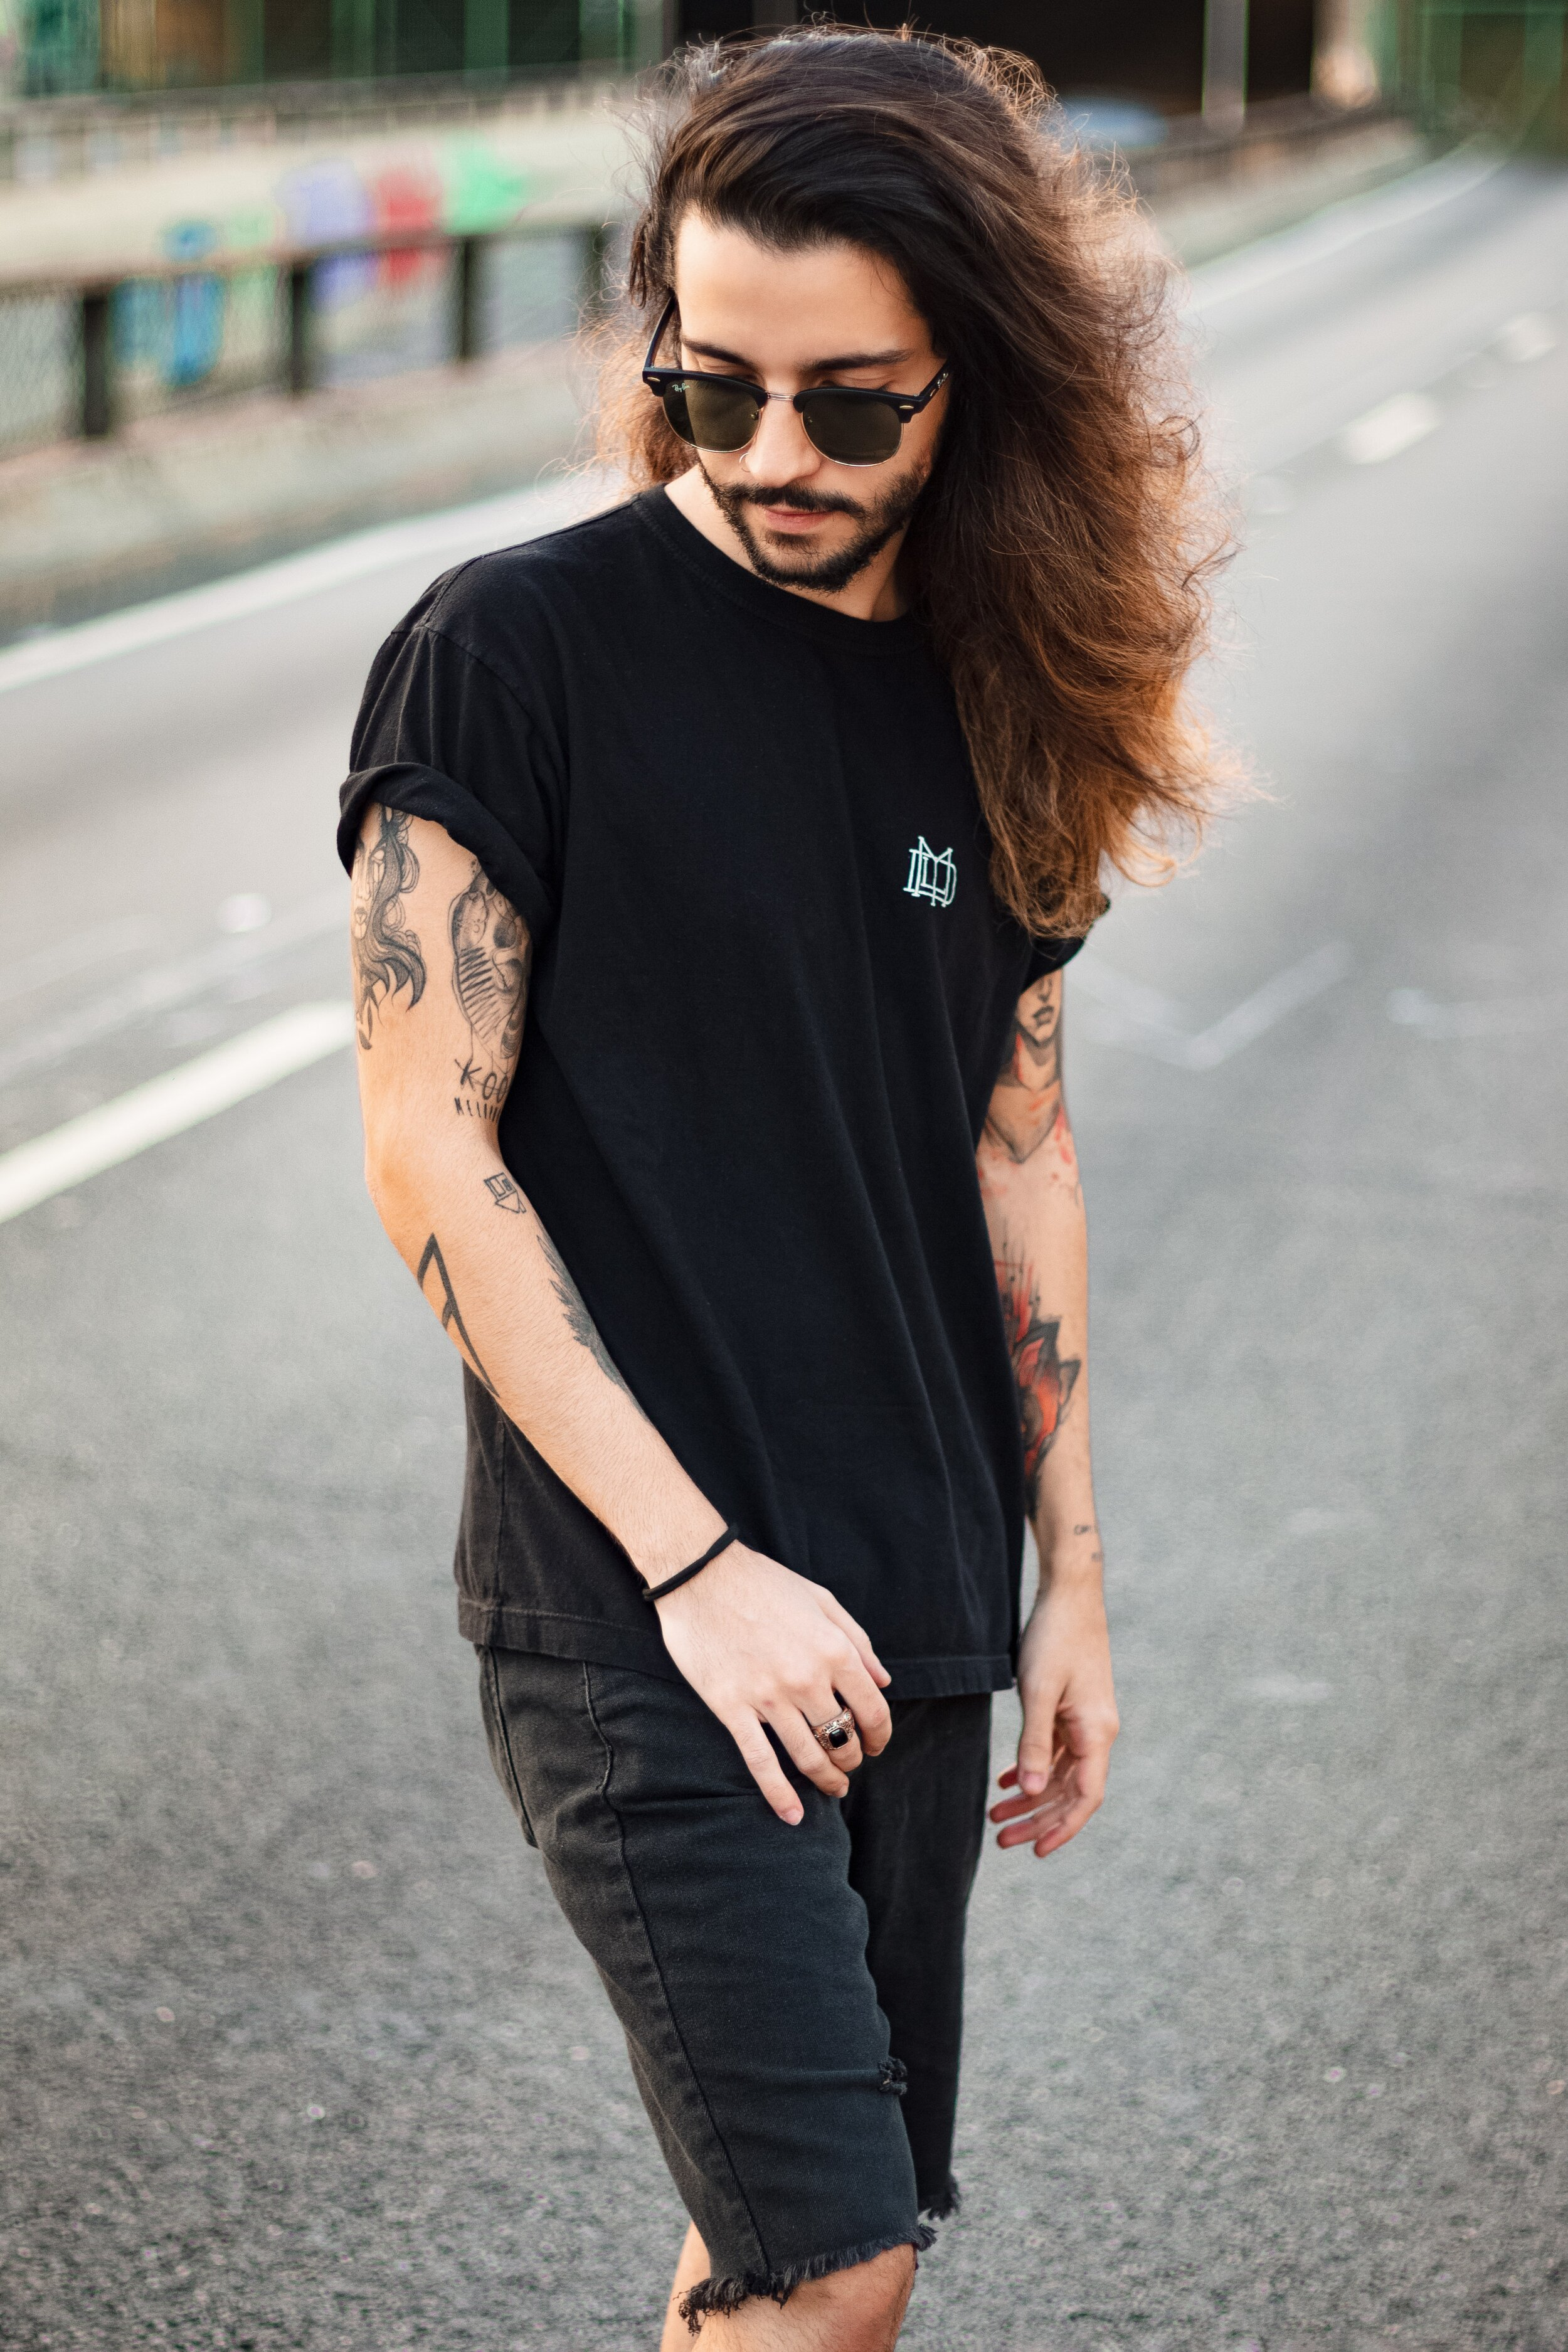 alone-black-t-shirt-casual-wear-2585828.jpg